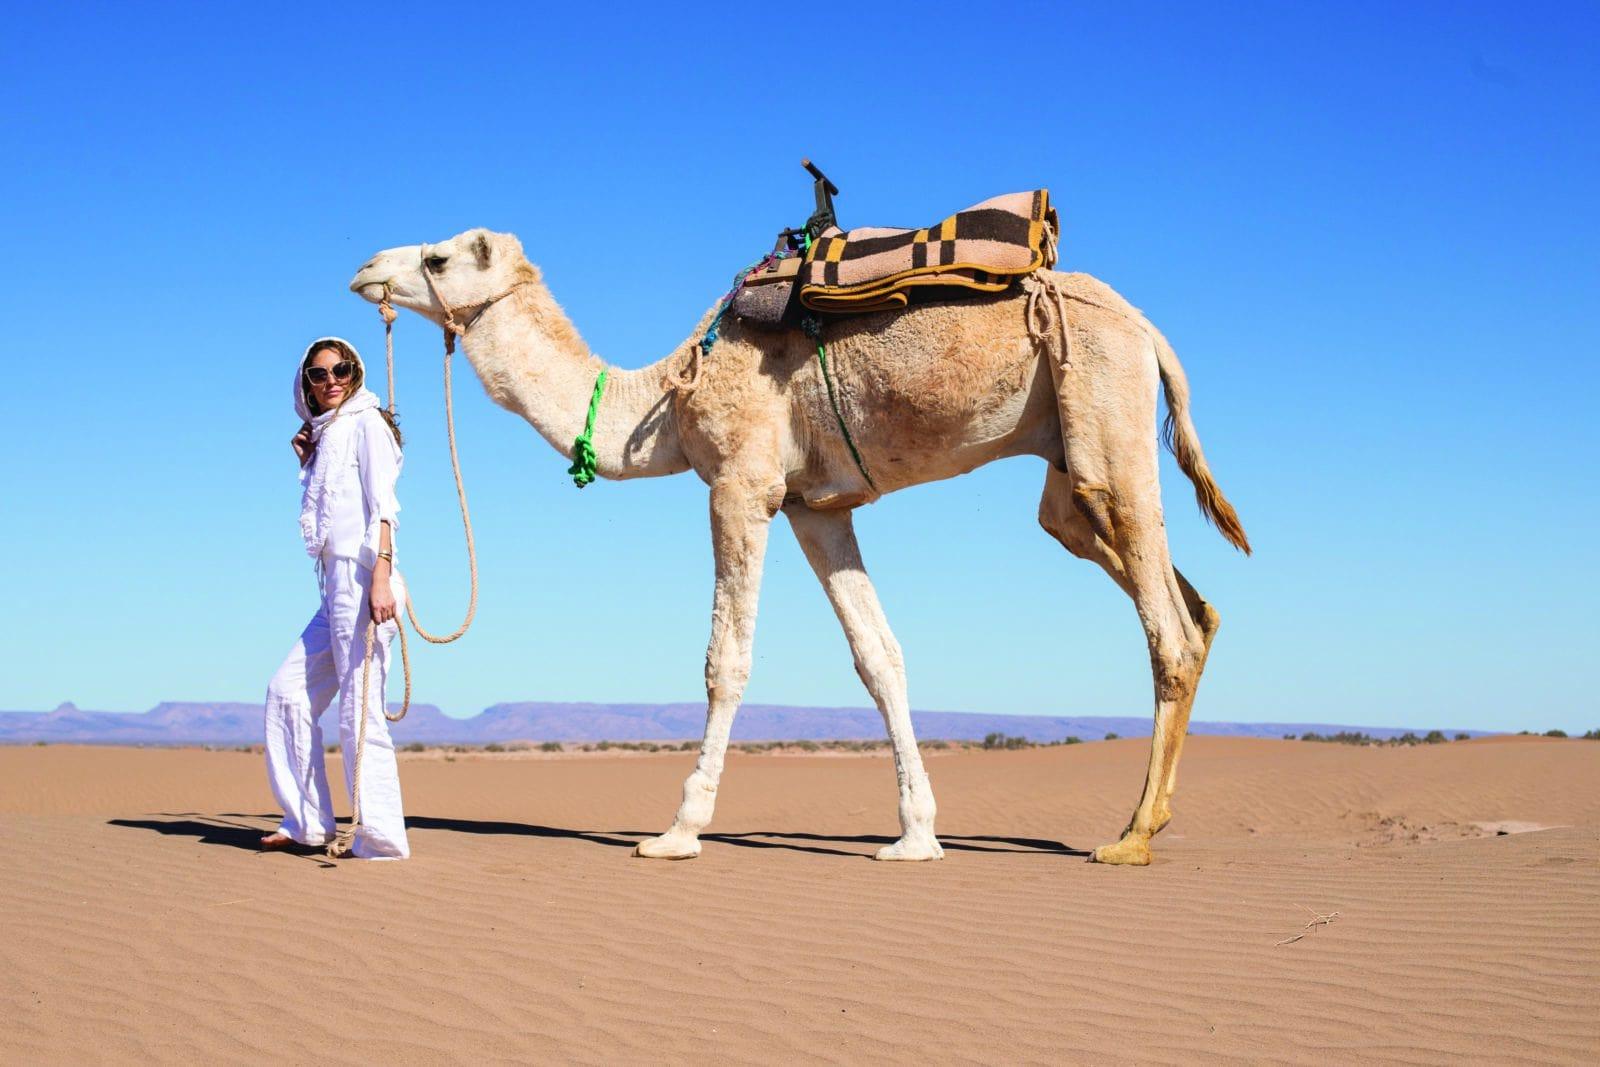 Megan Elliott Lush to Blush with a Camel